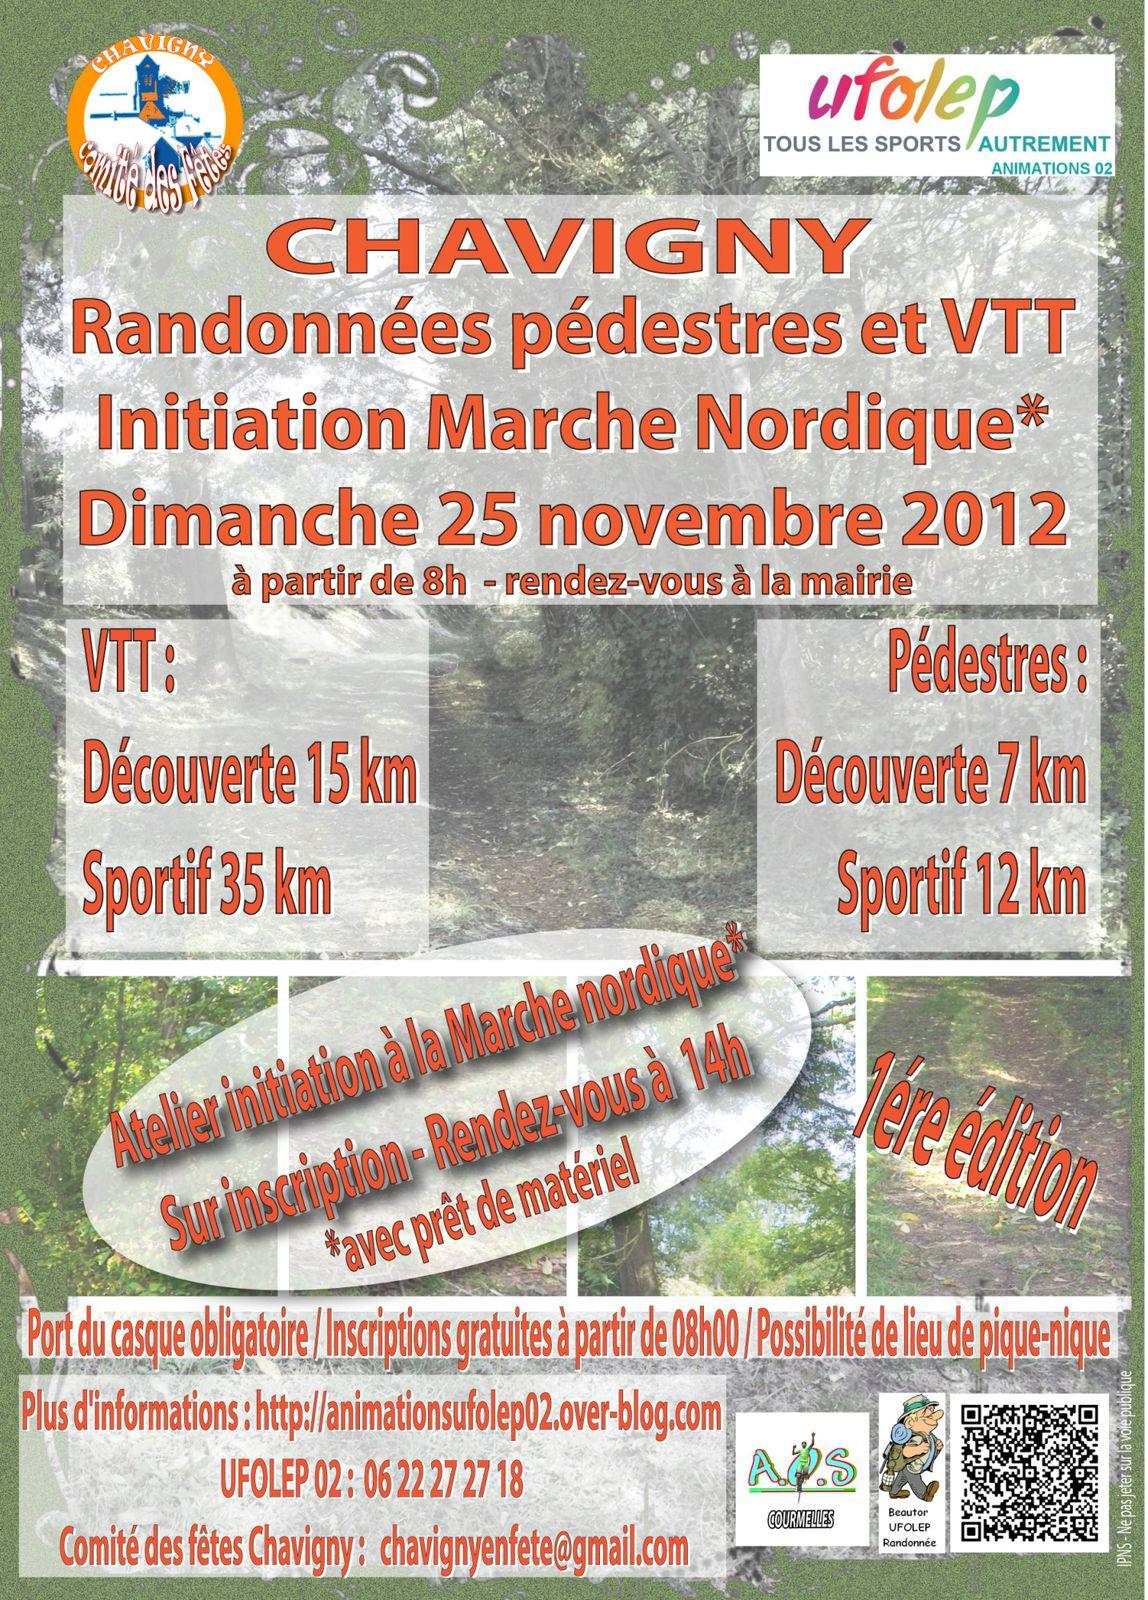 Les randos de Chavigny (25/11/2012) Affiche-Randonnees_Chavigny-251112